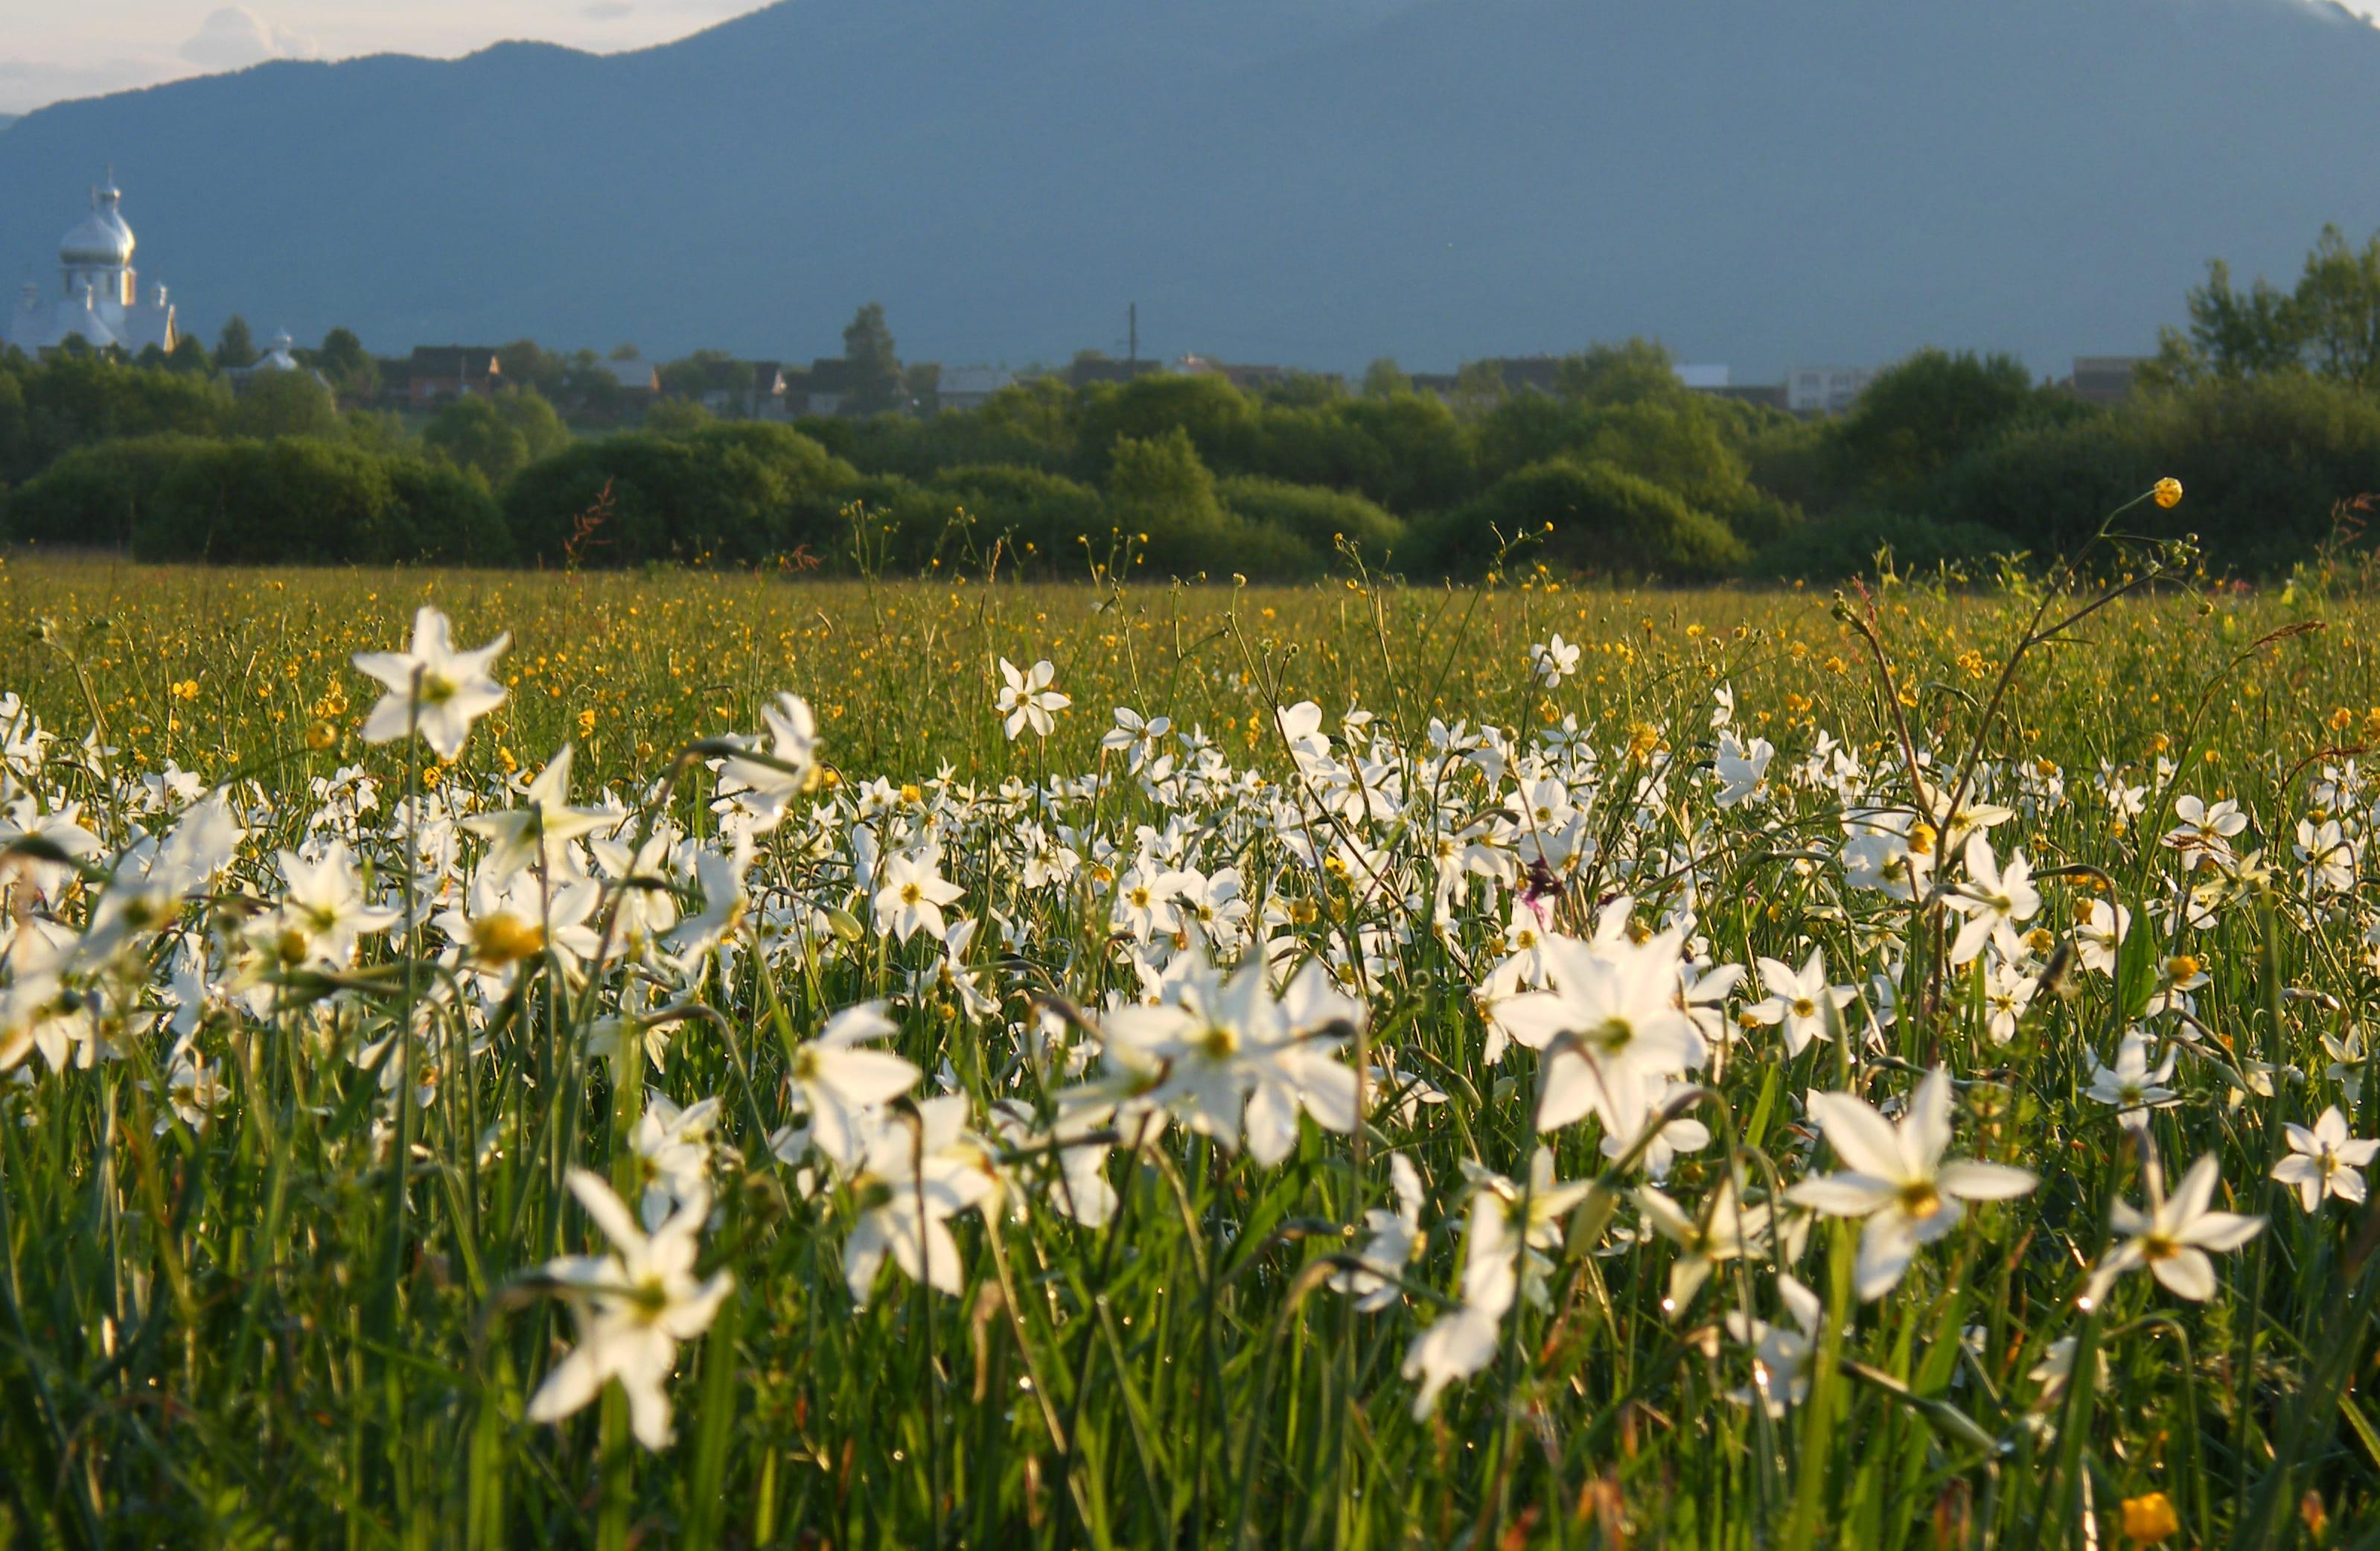 daffodils-photo-1